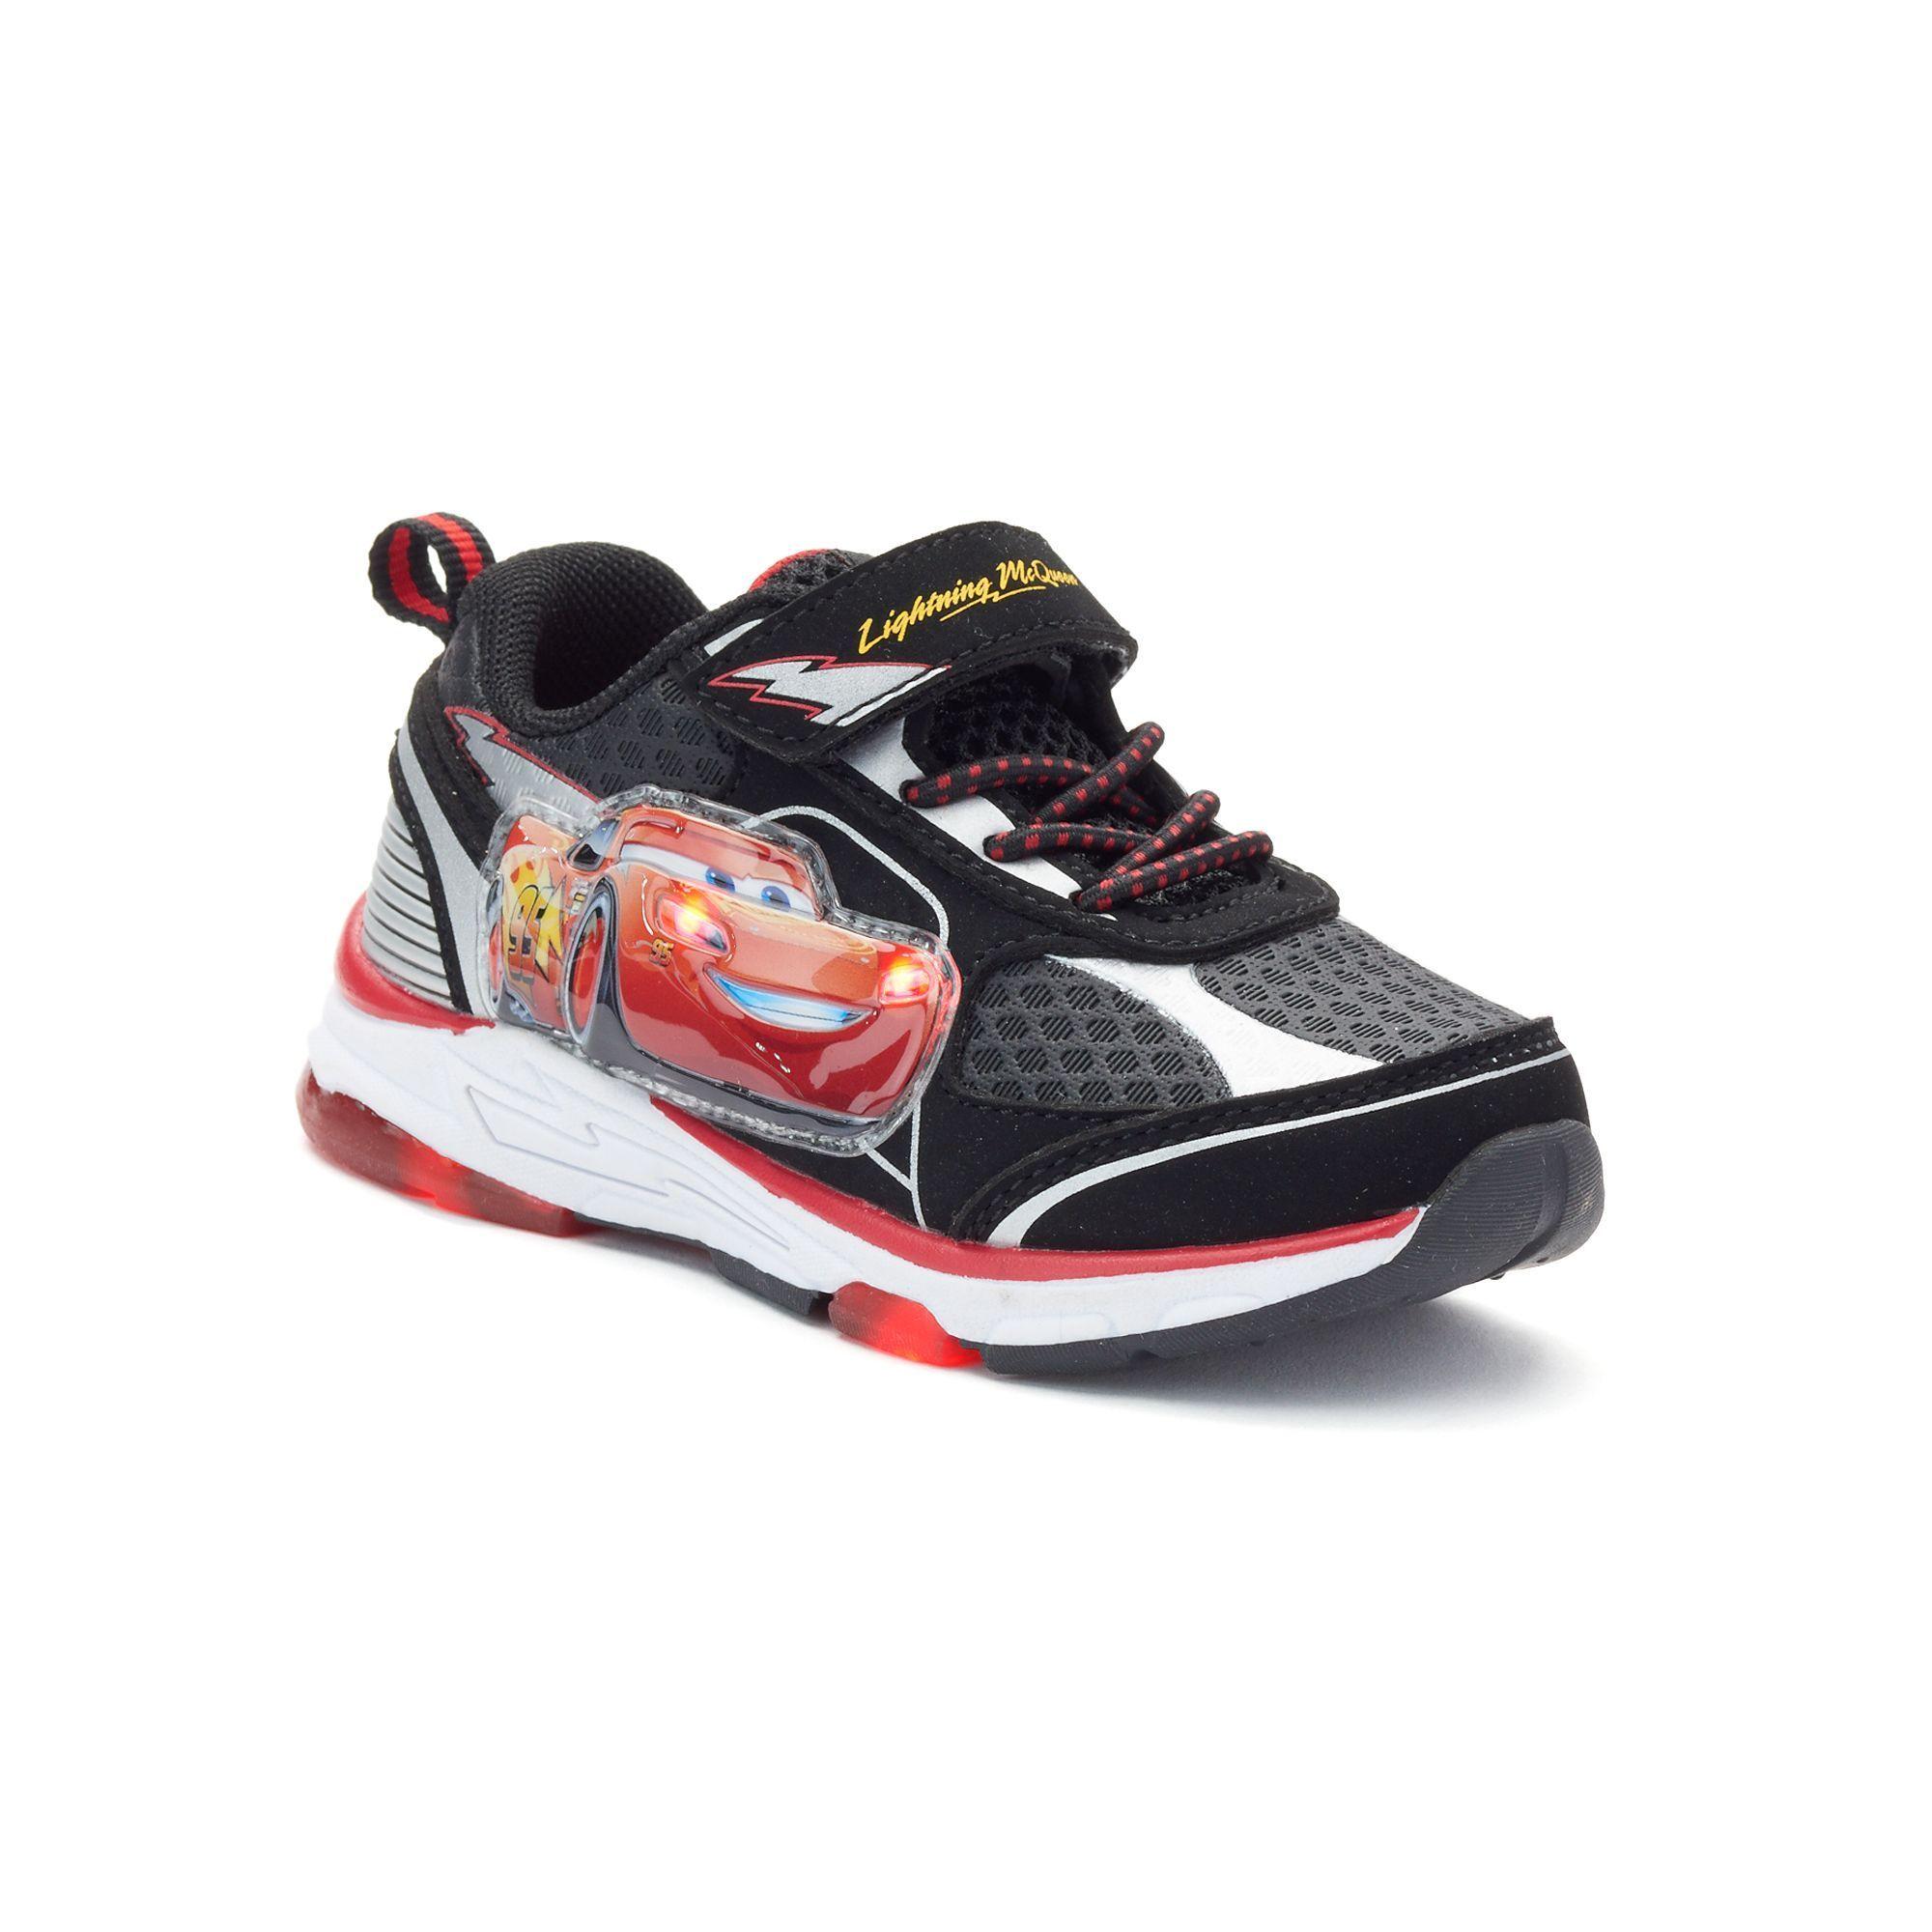 Disney Pixar Cars Lightning McQueen Toddler Boys Light Up Shoes